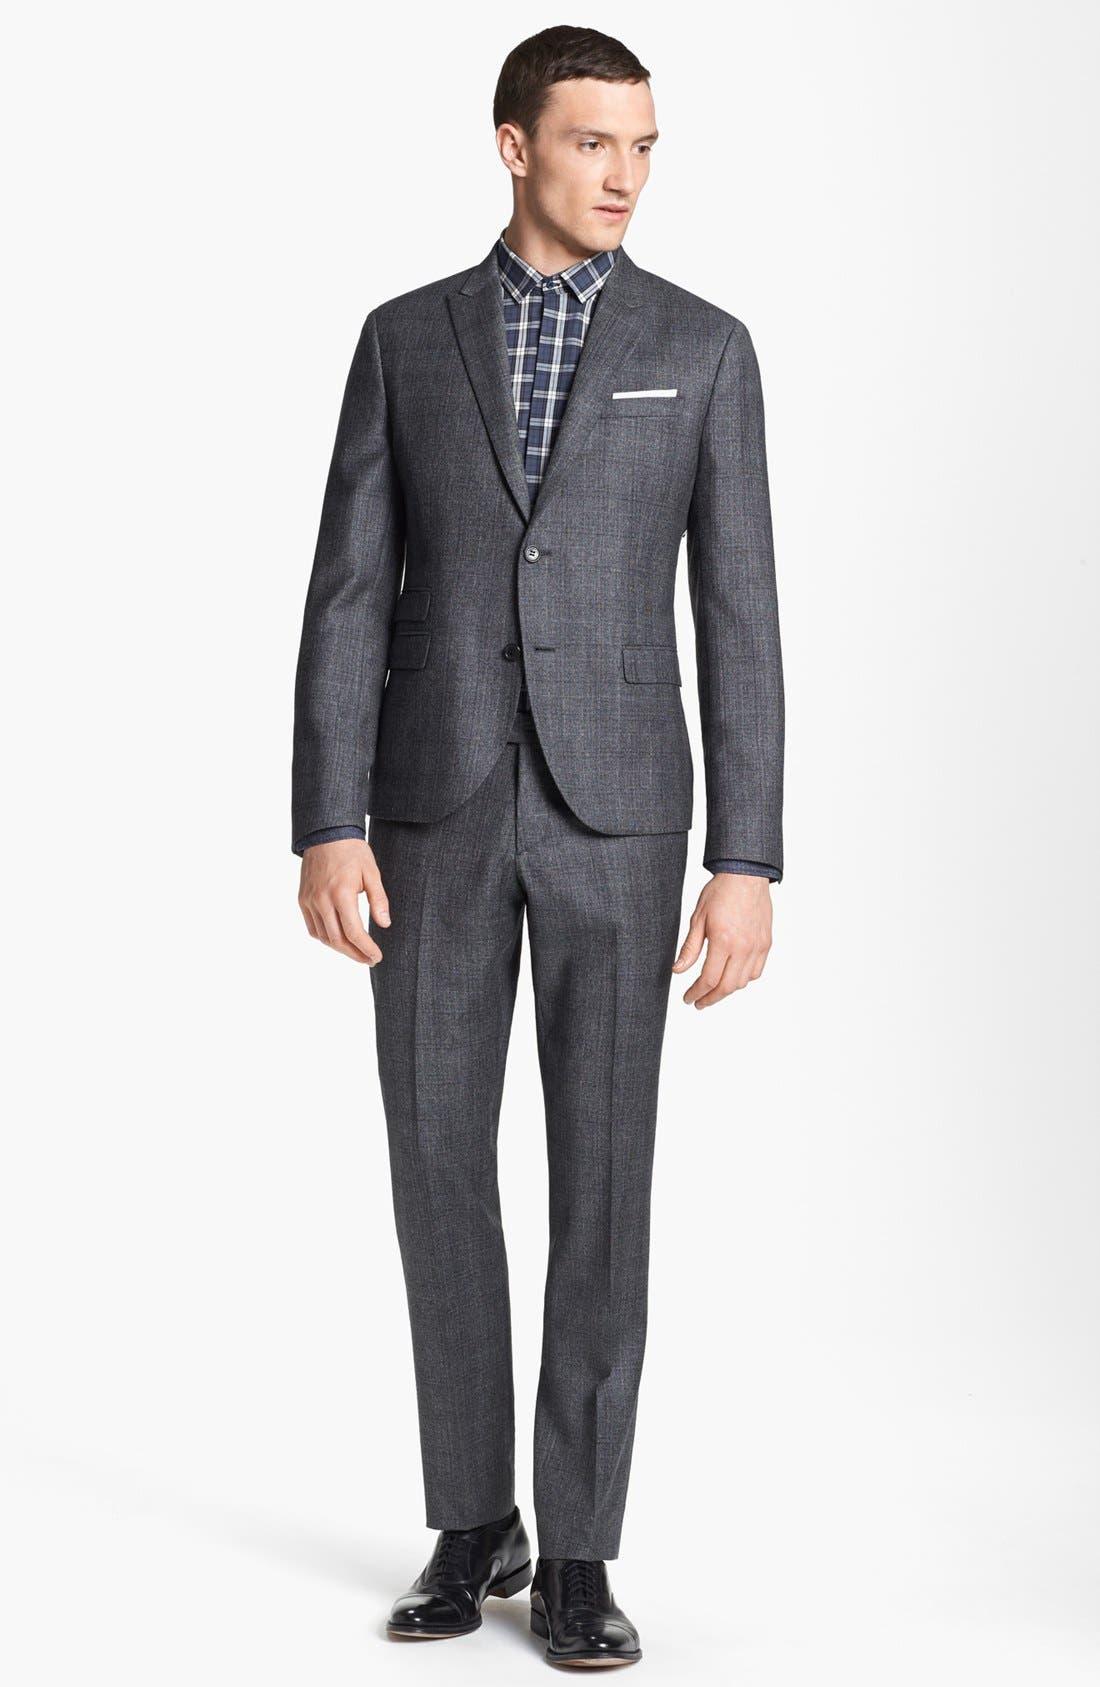 NEIL BARRETT, Windowpane Plaid Wool Suit, Main thumbnail 1, color, 020